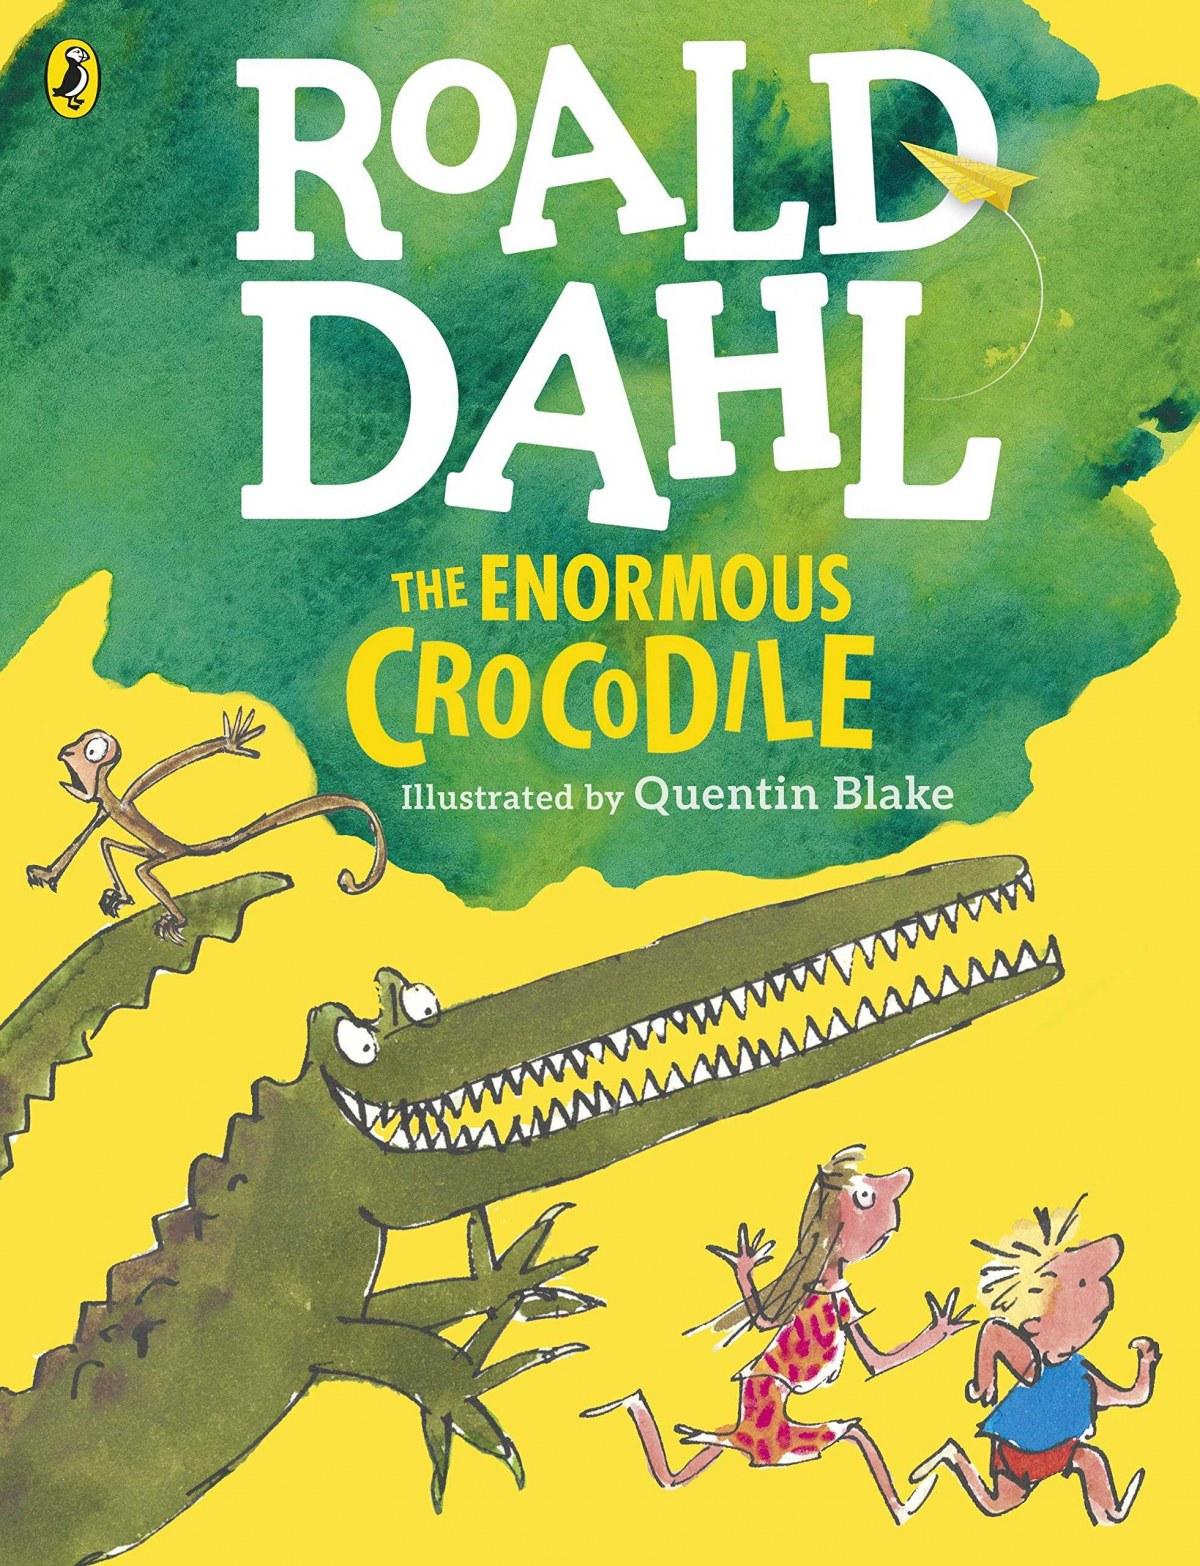 Enormous crocodile, The